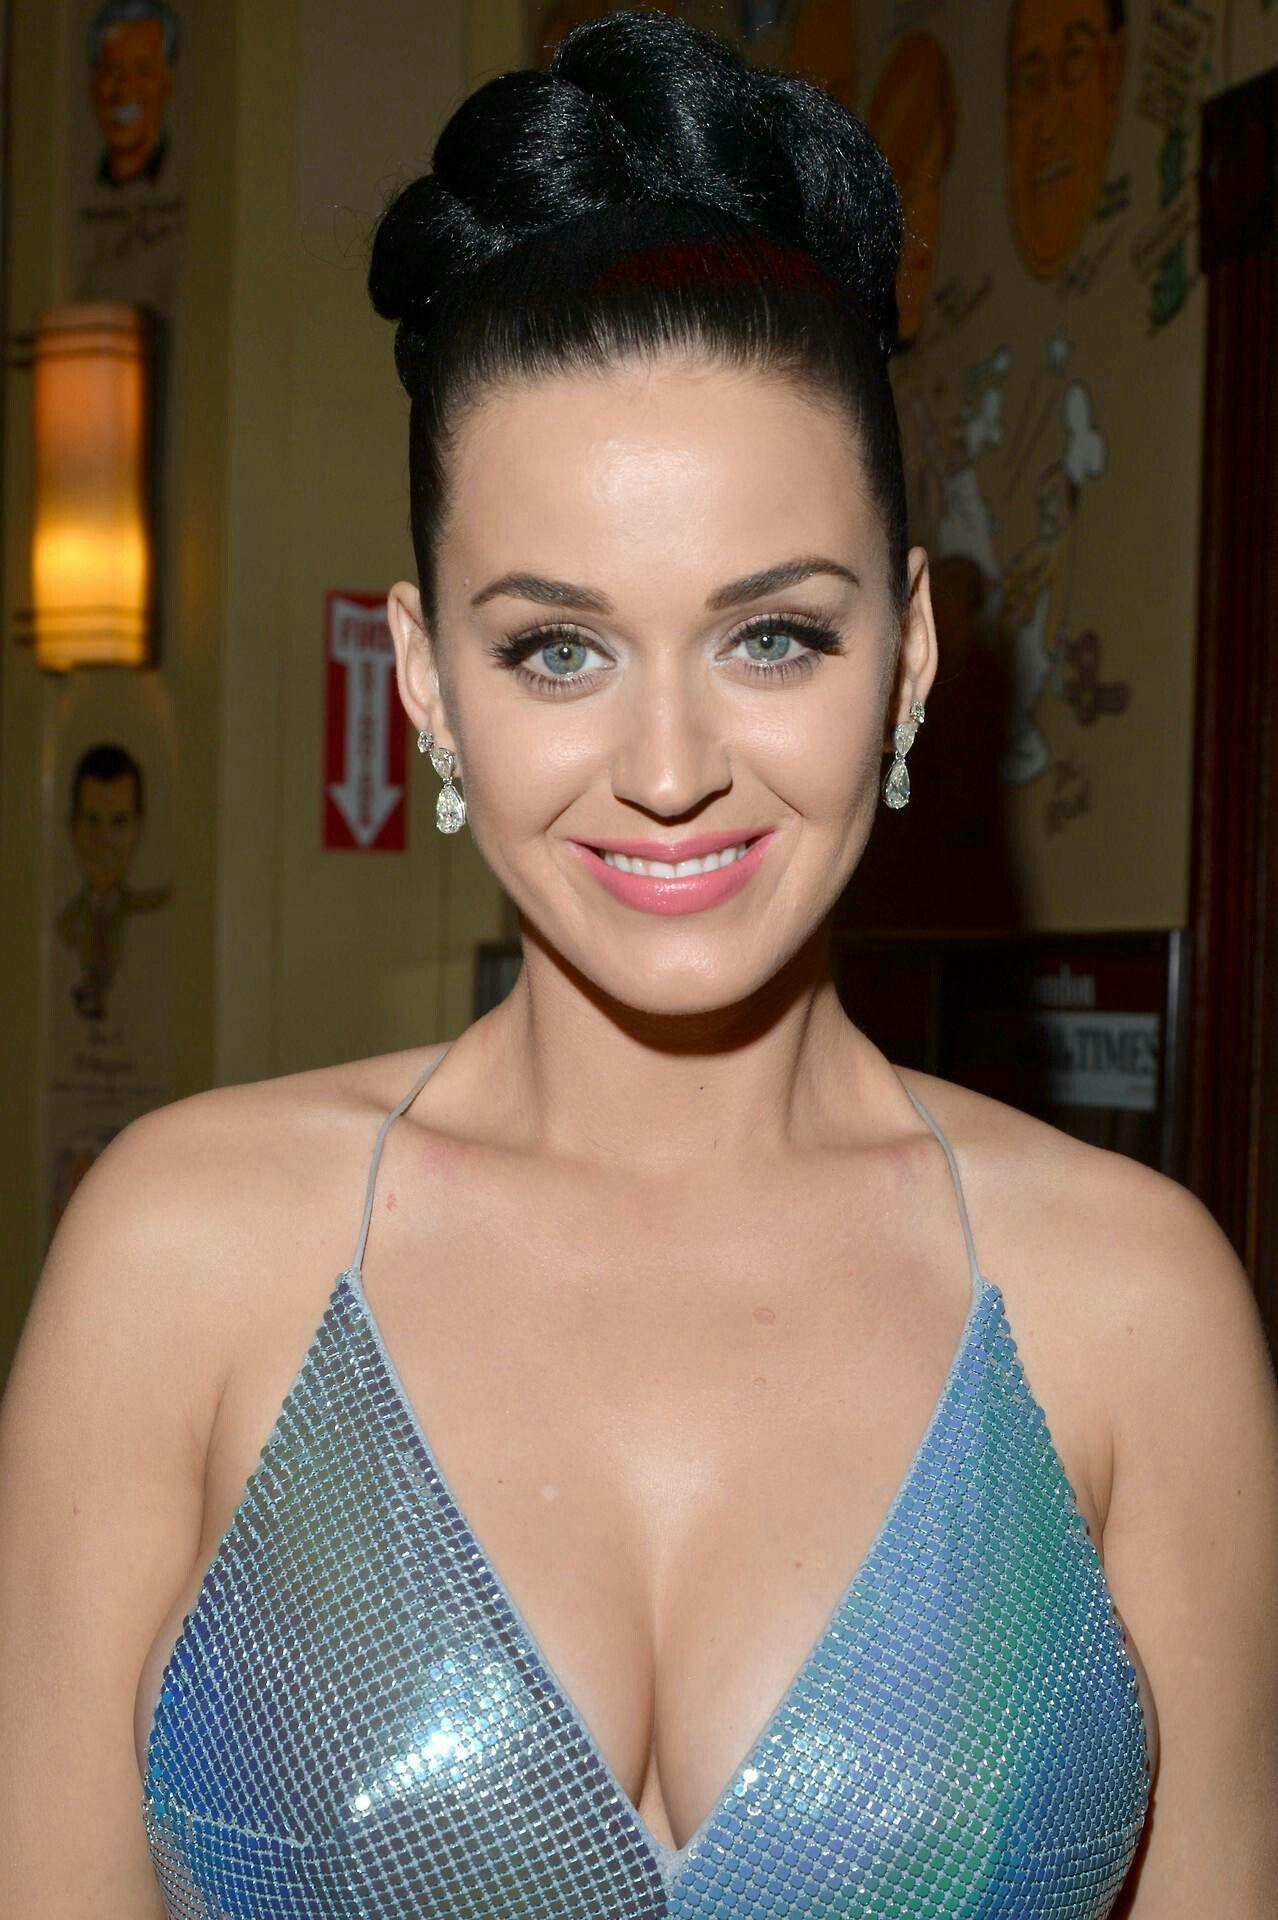 Katy Perry   Katy perry hot, Katty perry, Katy perry